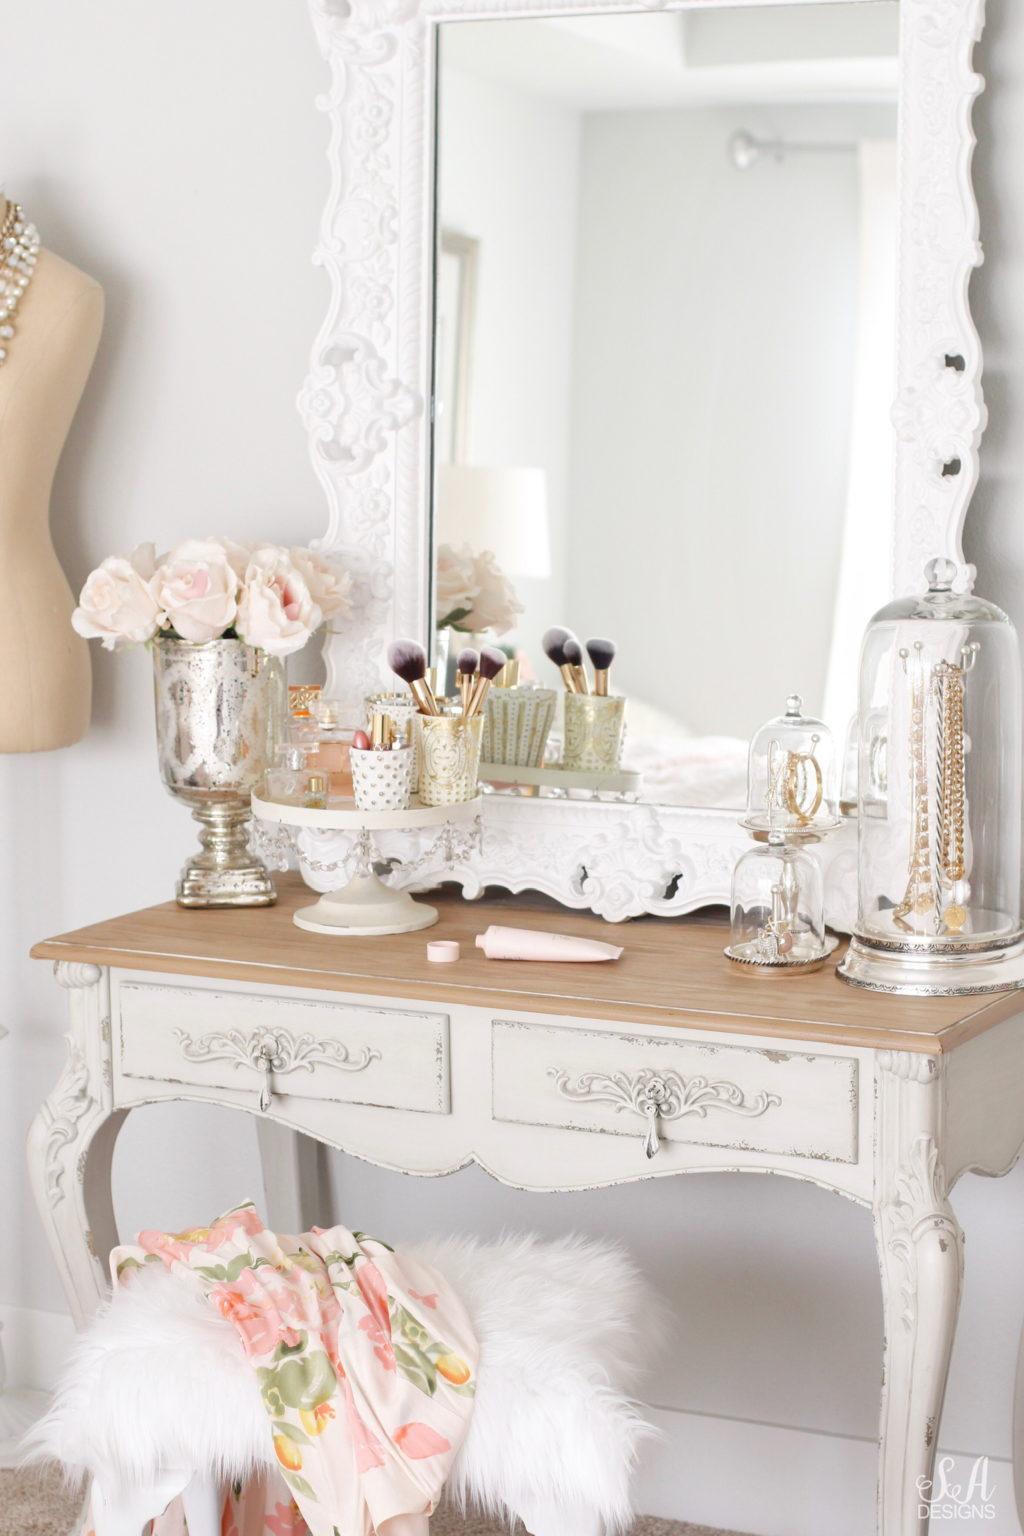 Tips To Organize Style An Elegant Vanity Summer Adams